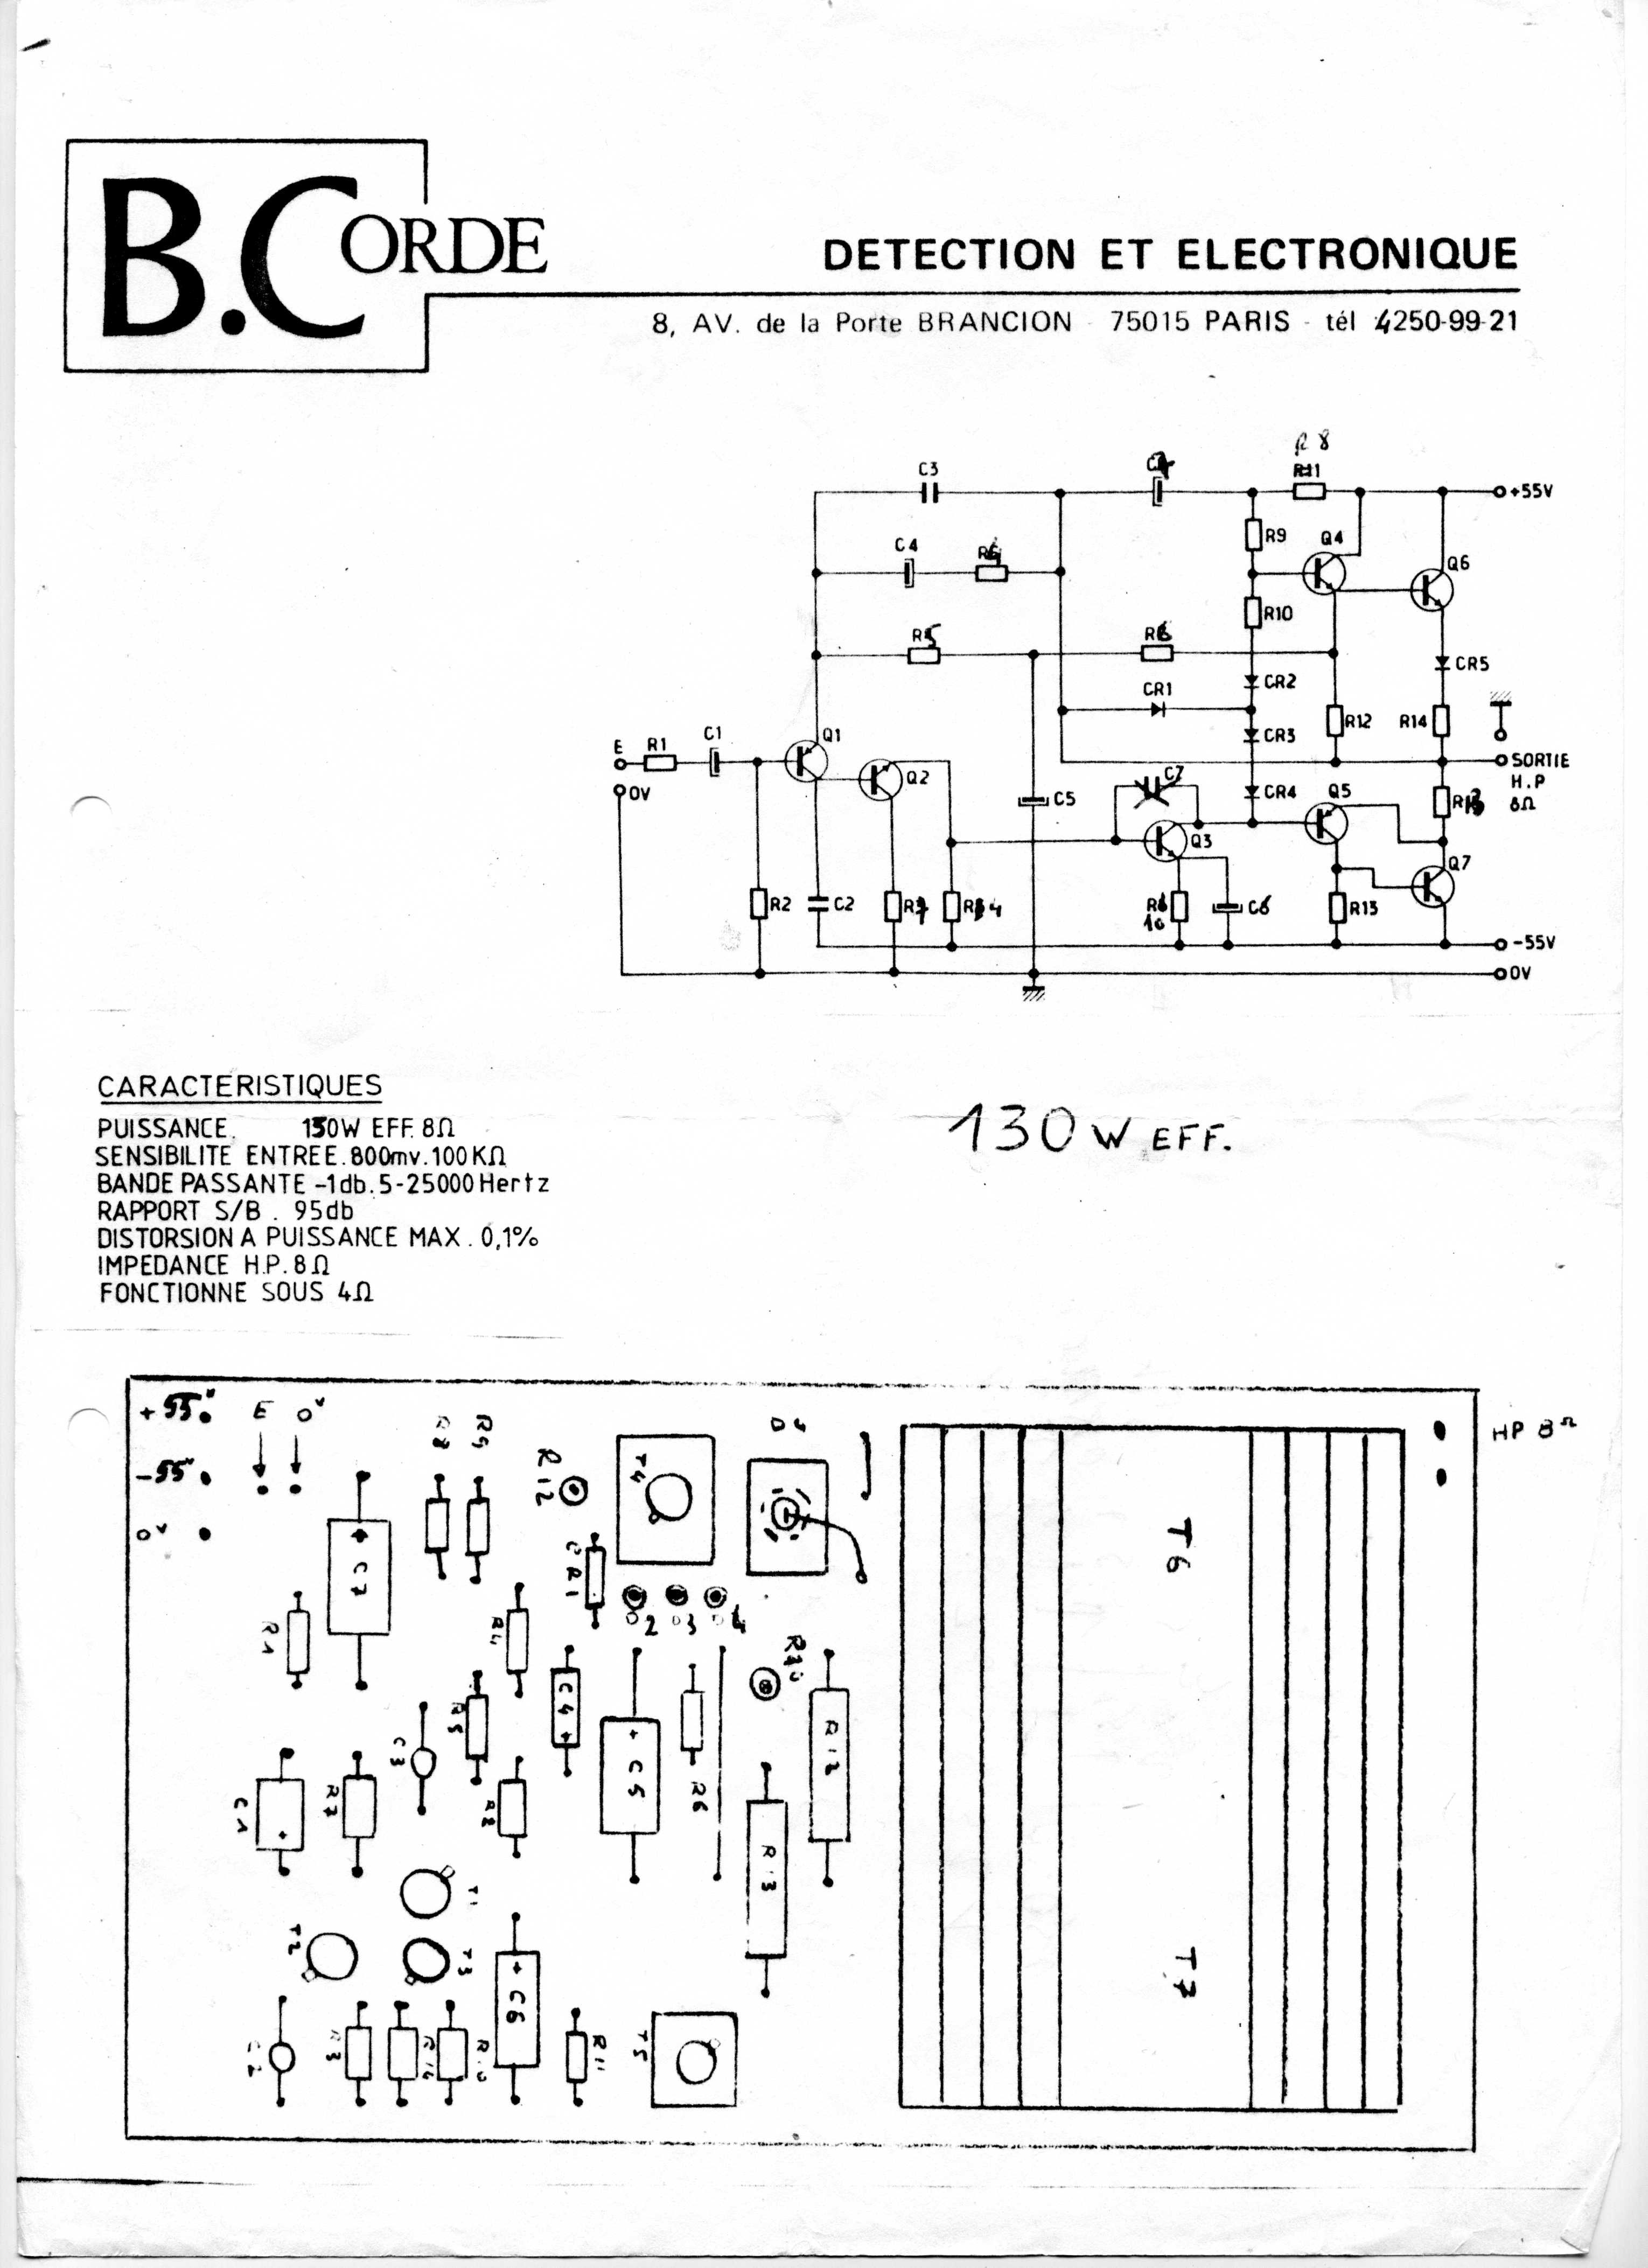 Rca Power Amplifier Schematic Electrical Wiring Diagrams 150w Lm3886 Documentation Issu Dun Module De Puissance B Corde Le Schma Est Transistor